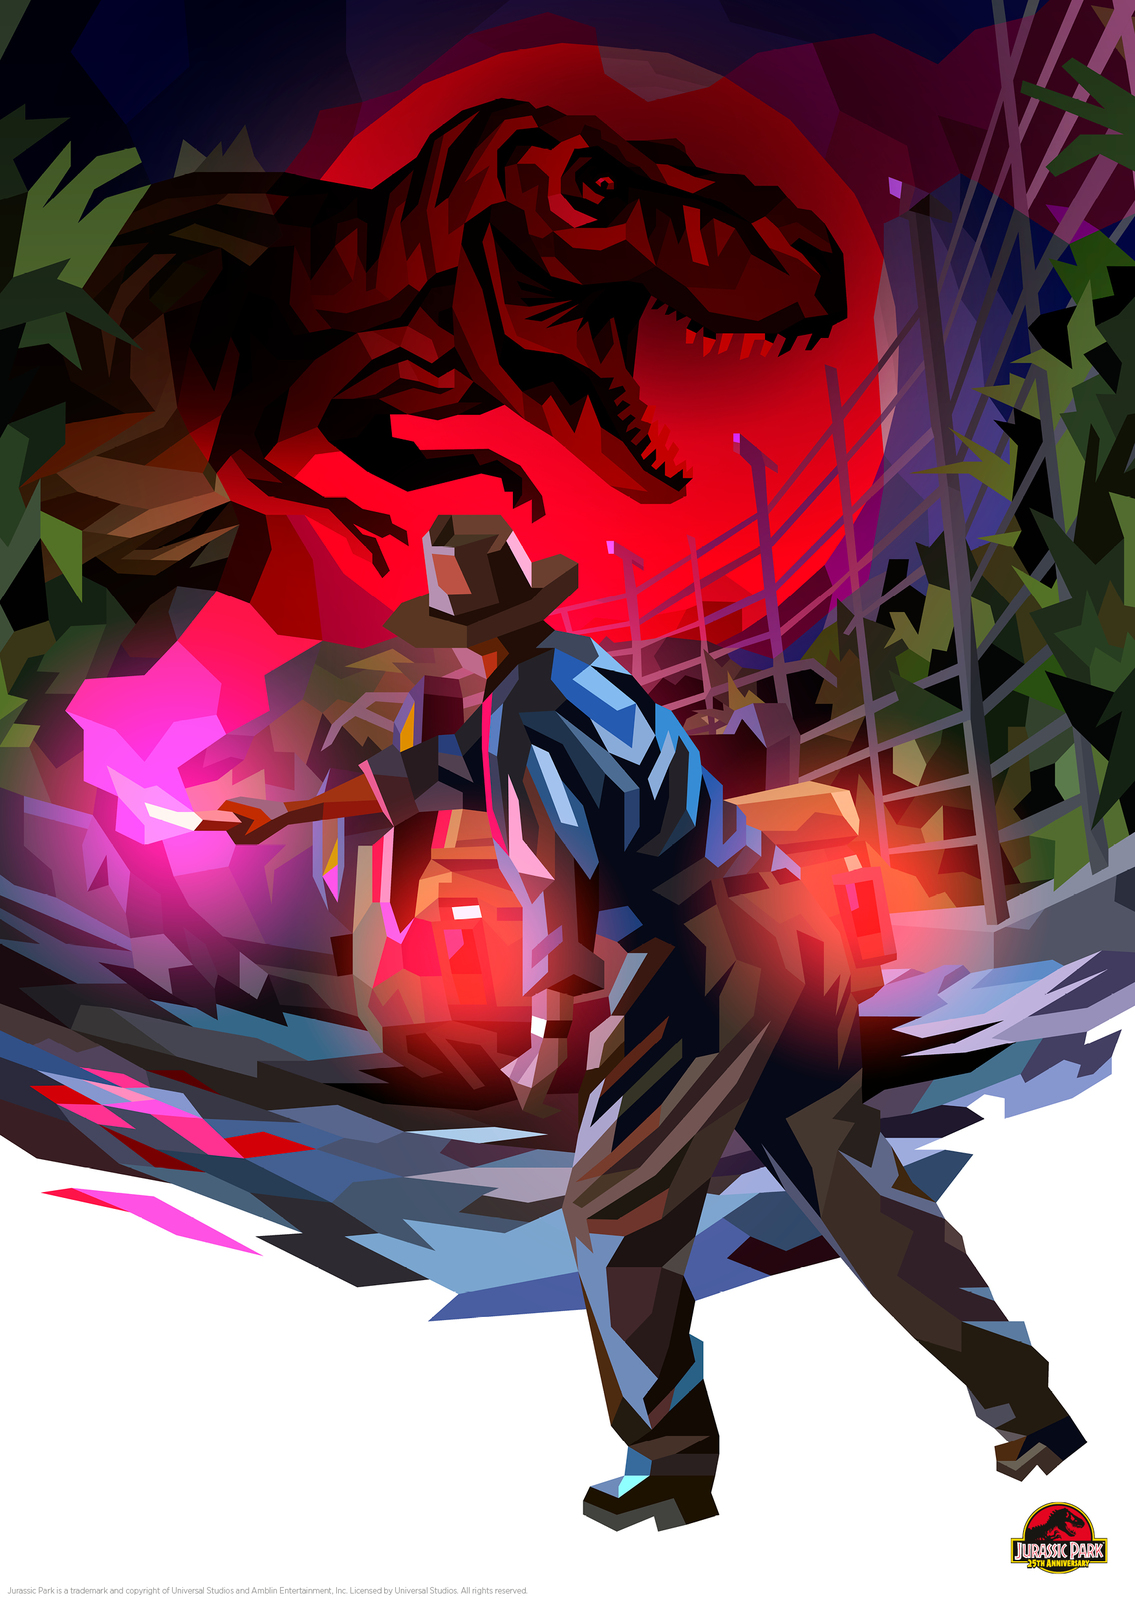 Jurassic Park: Premium Art Print - Park Life image